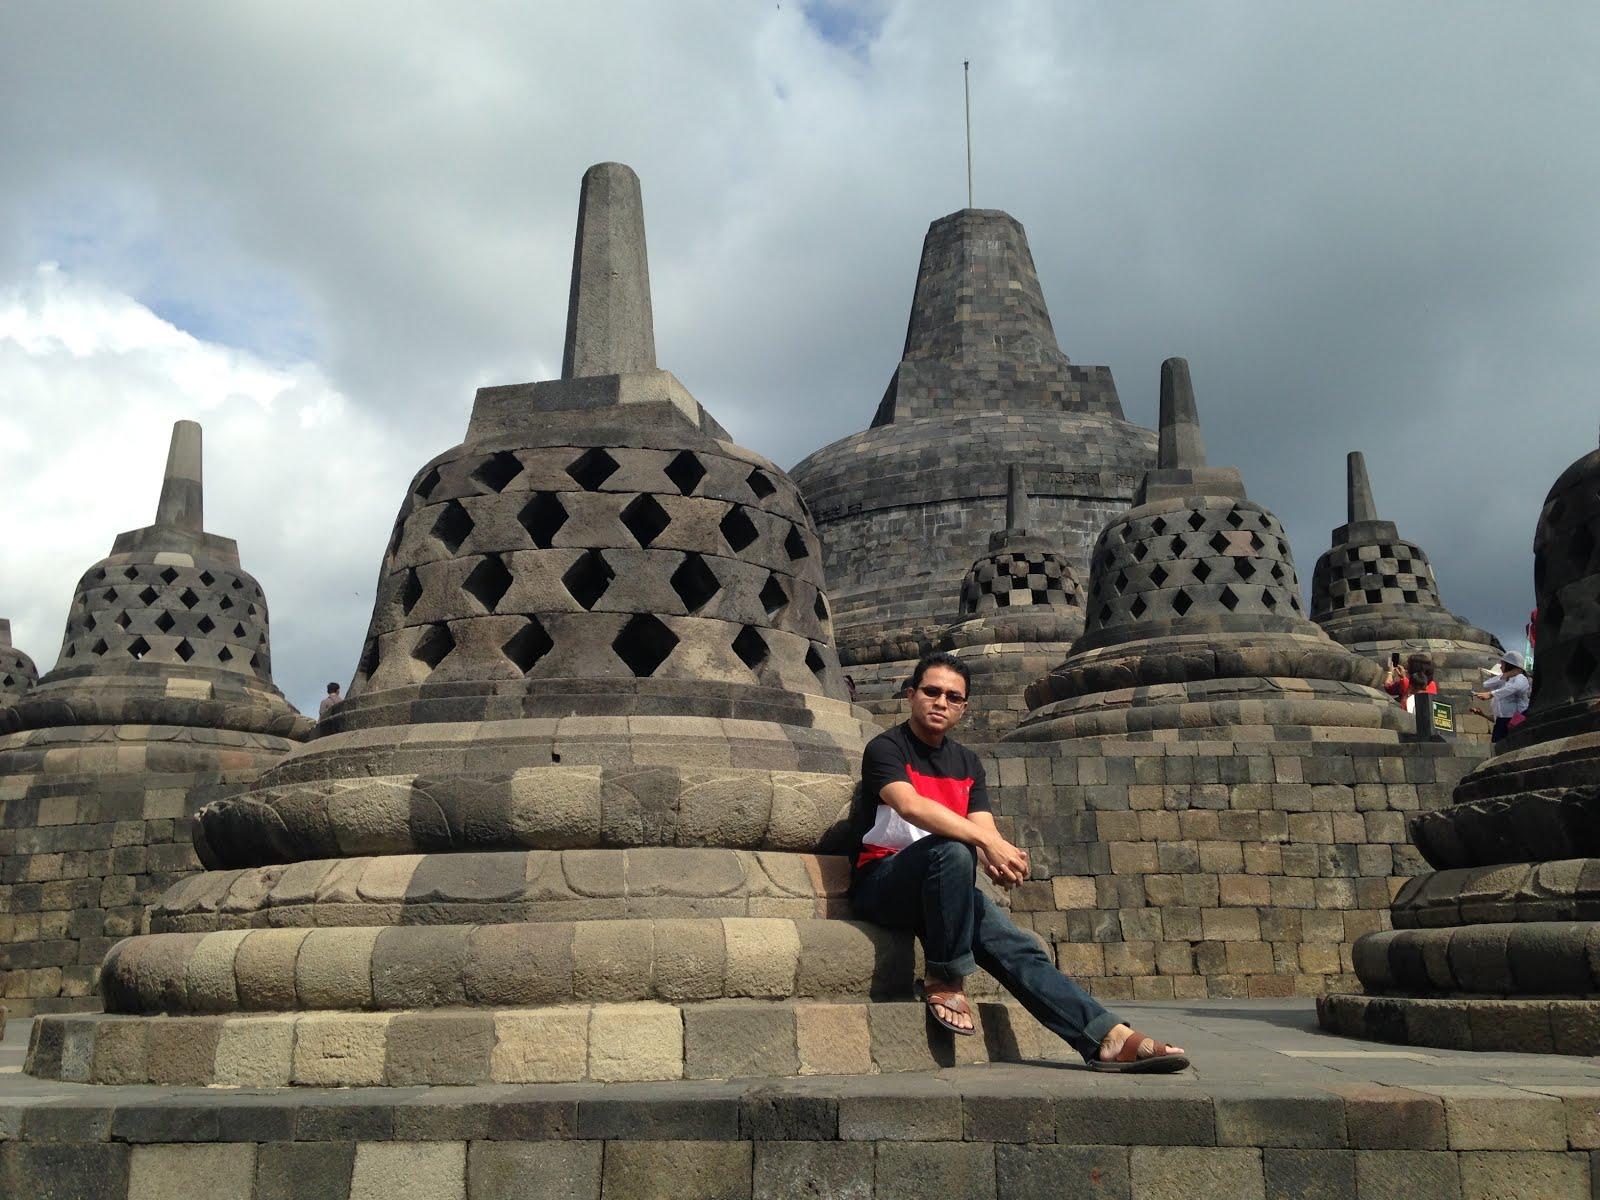 YOKYAKARTA, PULAU JAWA, INDONESIA